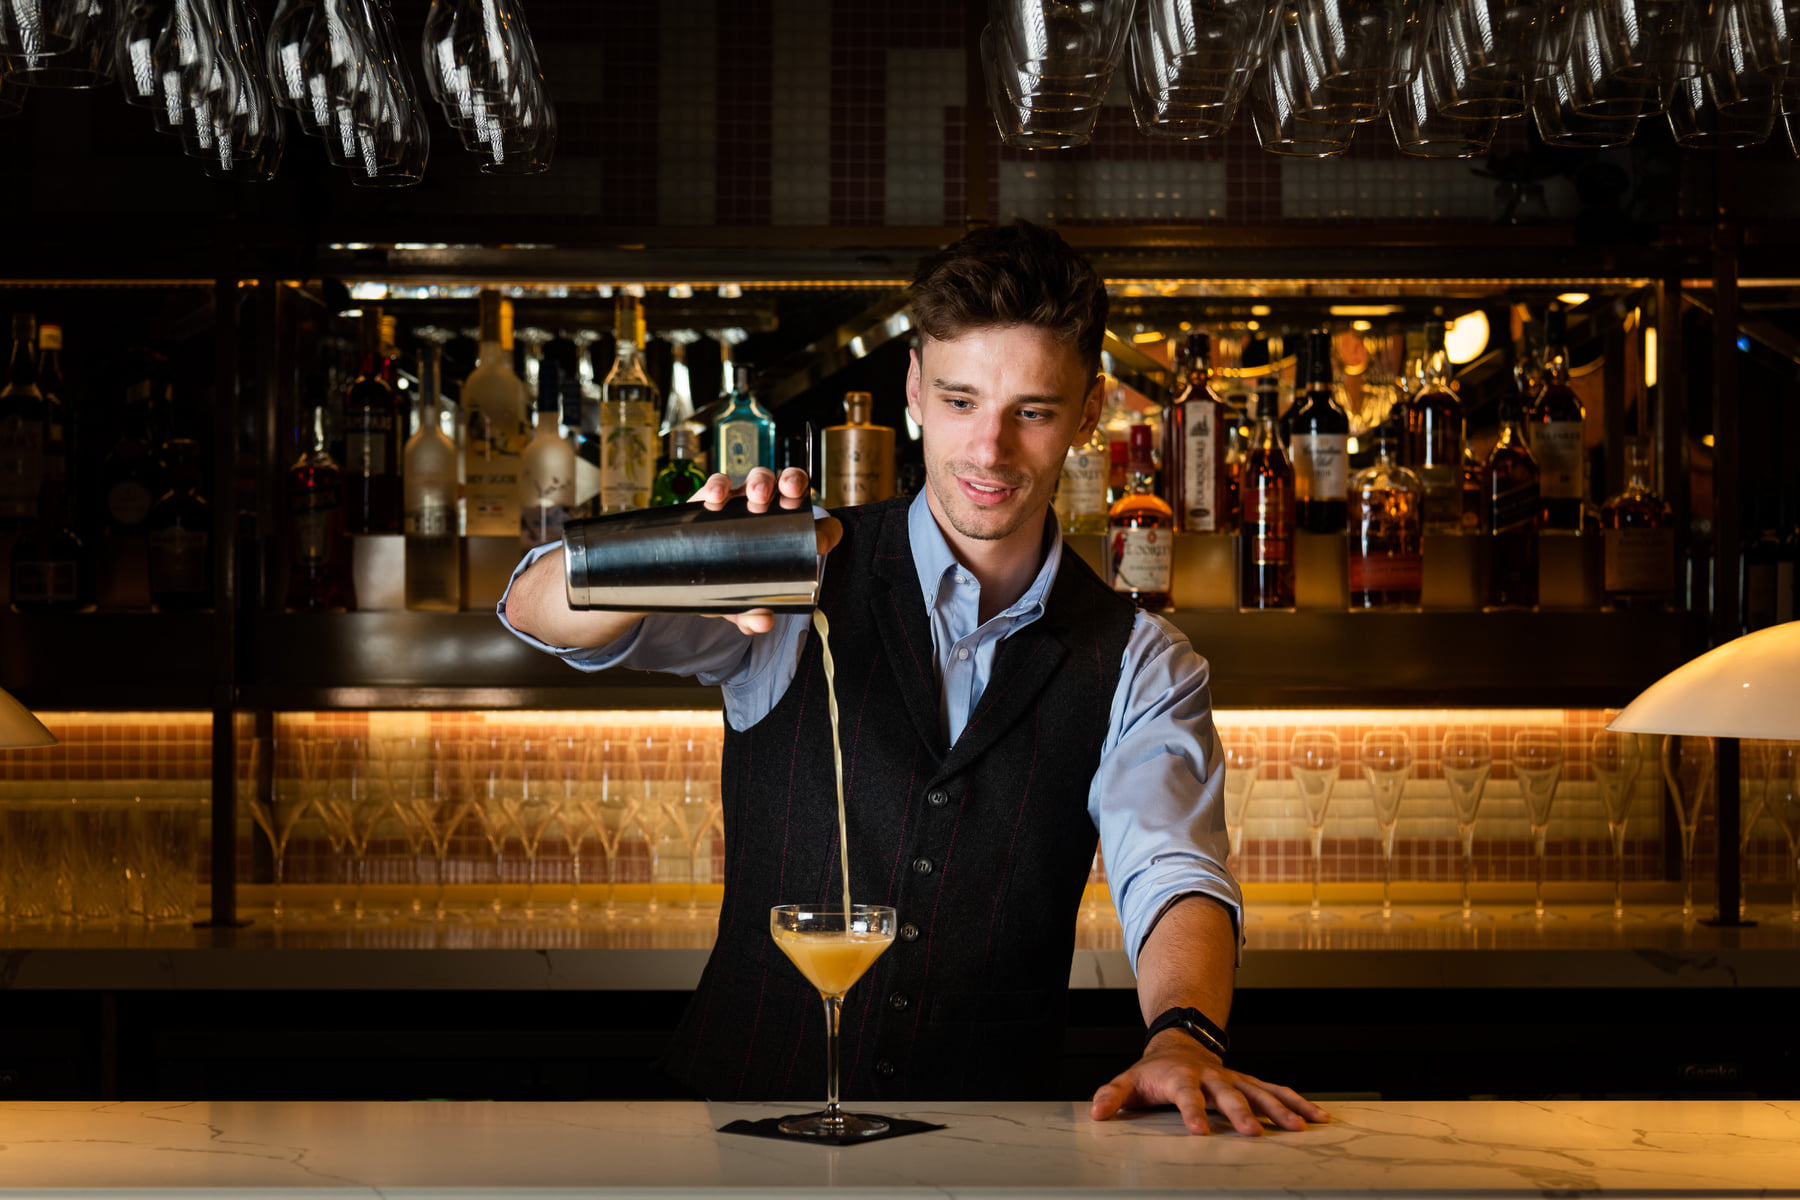 ragdale hall twilight bar